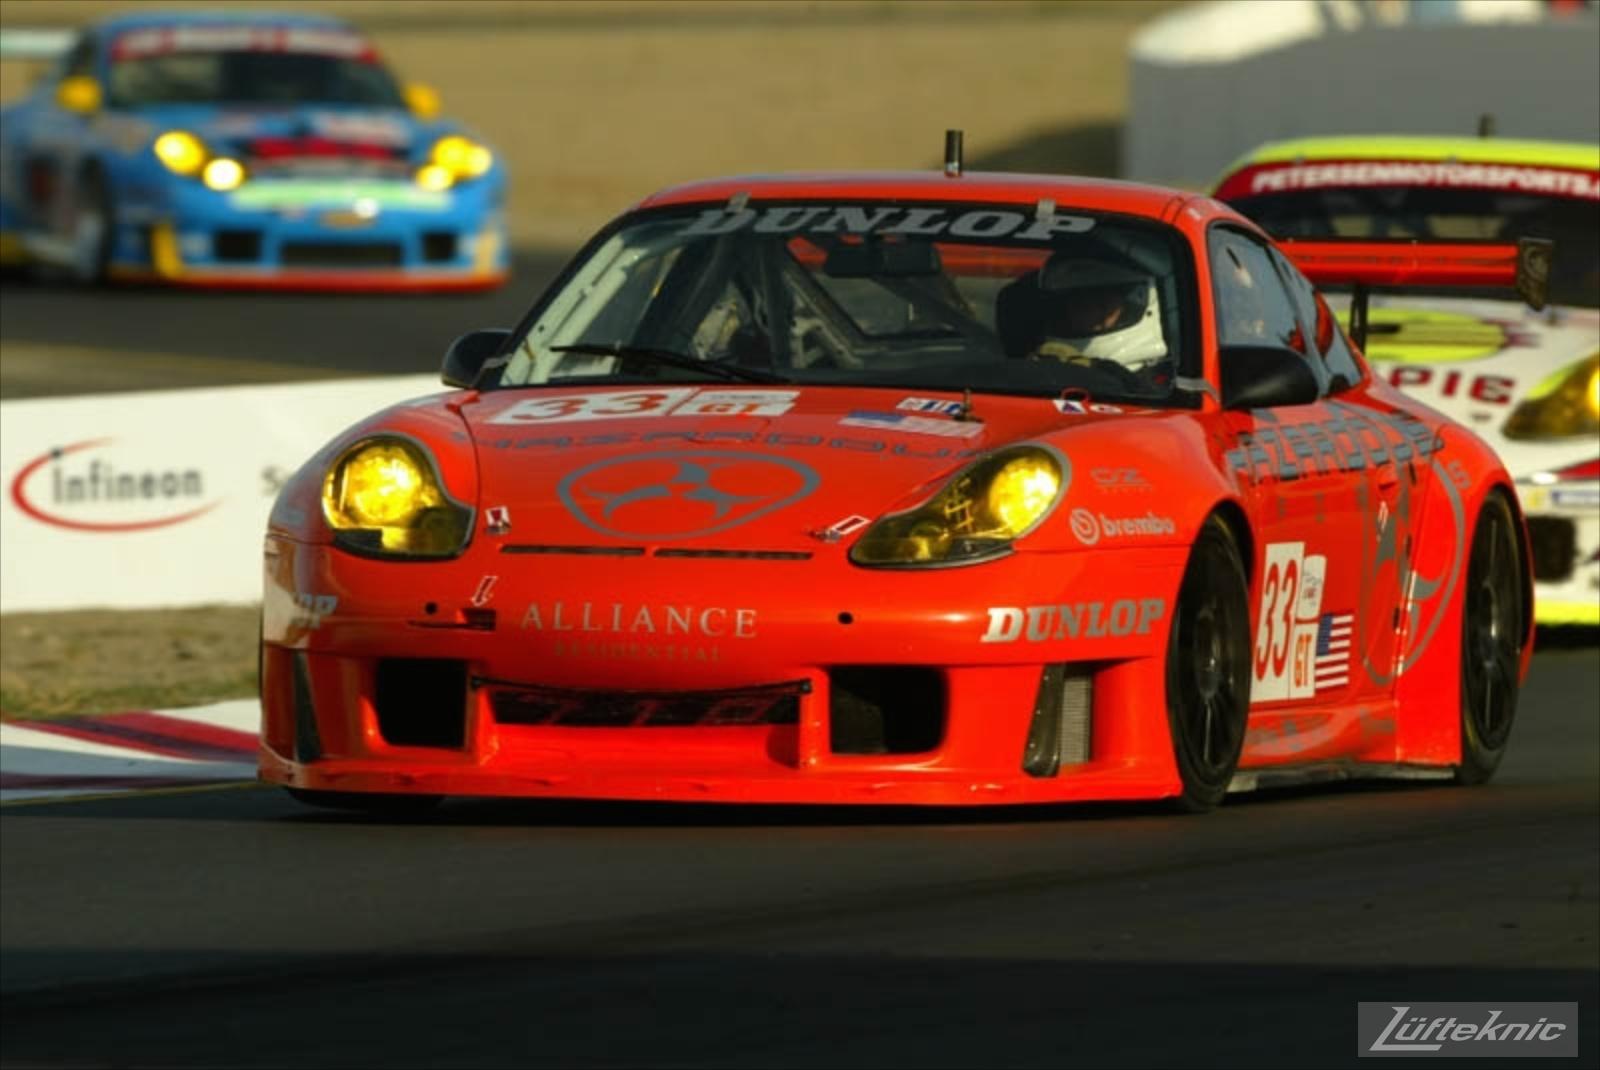 2003 Hazardous Sports Porsche 996 GT3 RS